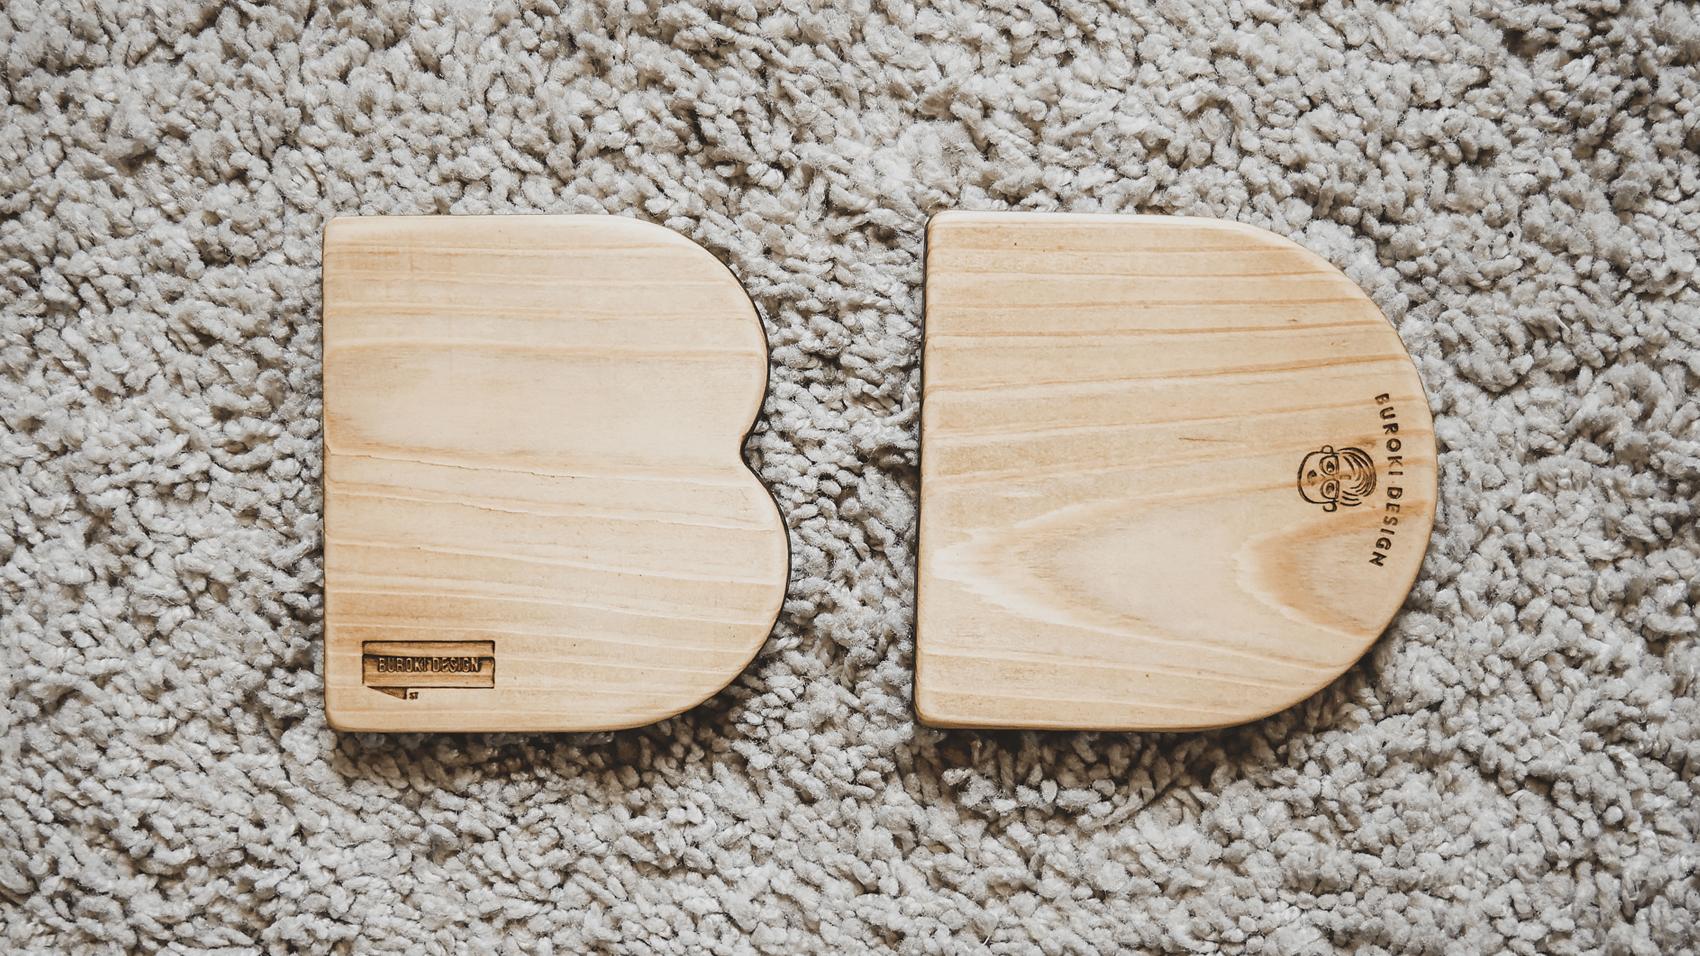 BUROKI designのオリジナル木製コースターの全体像 その1